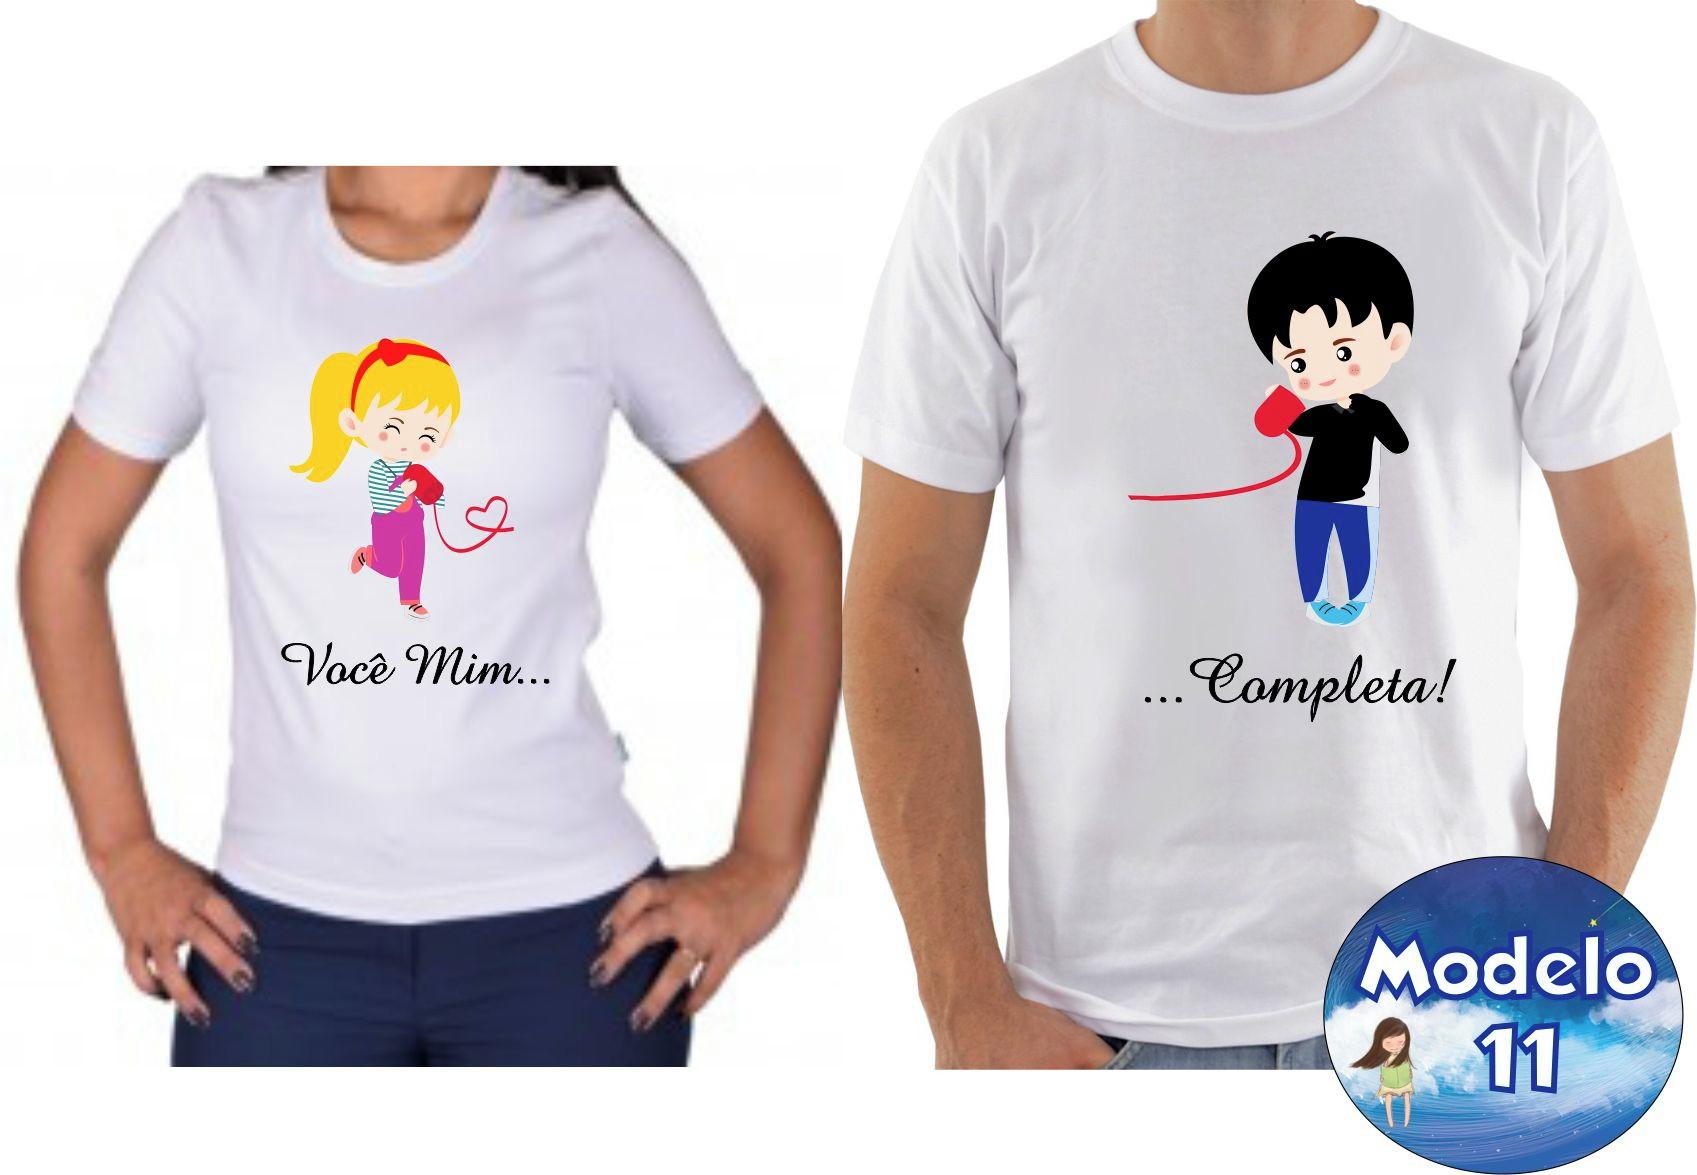 da0bf12c5bd19 Camiseta Personalizada para Casal | Elo7